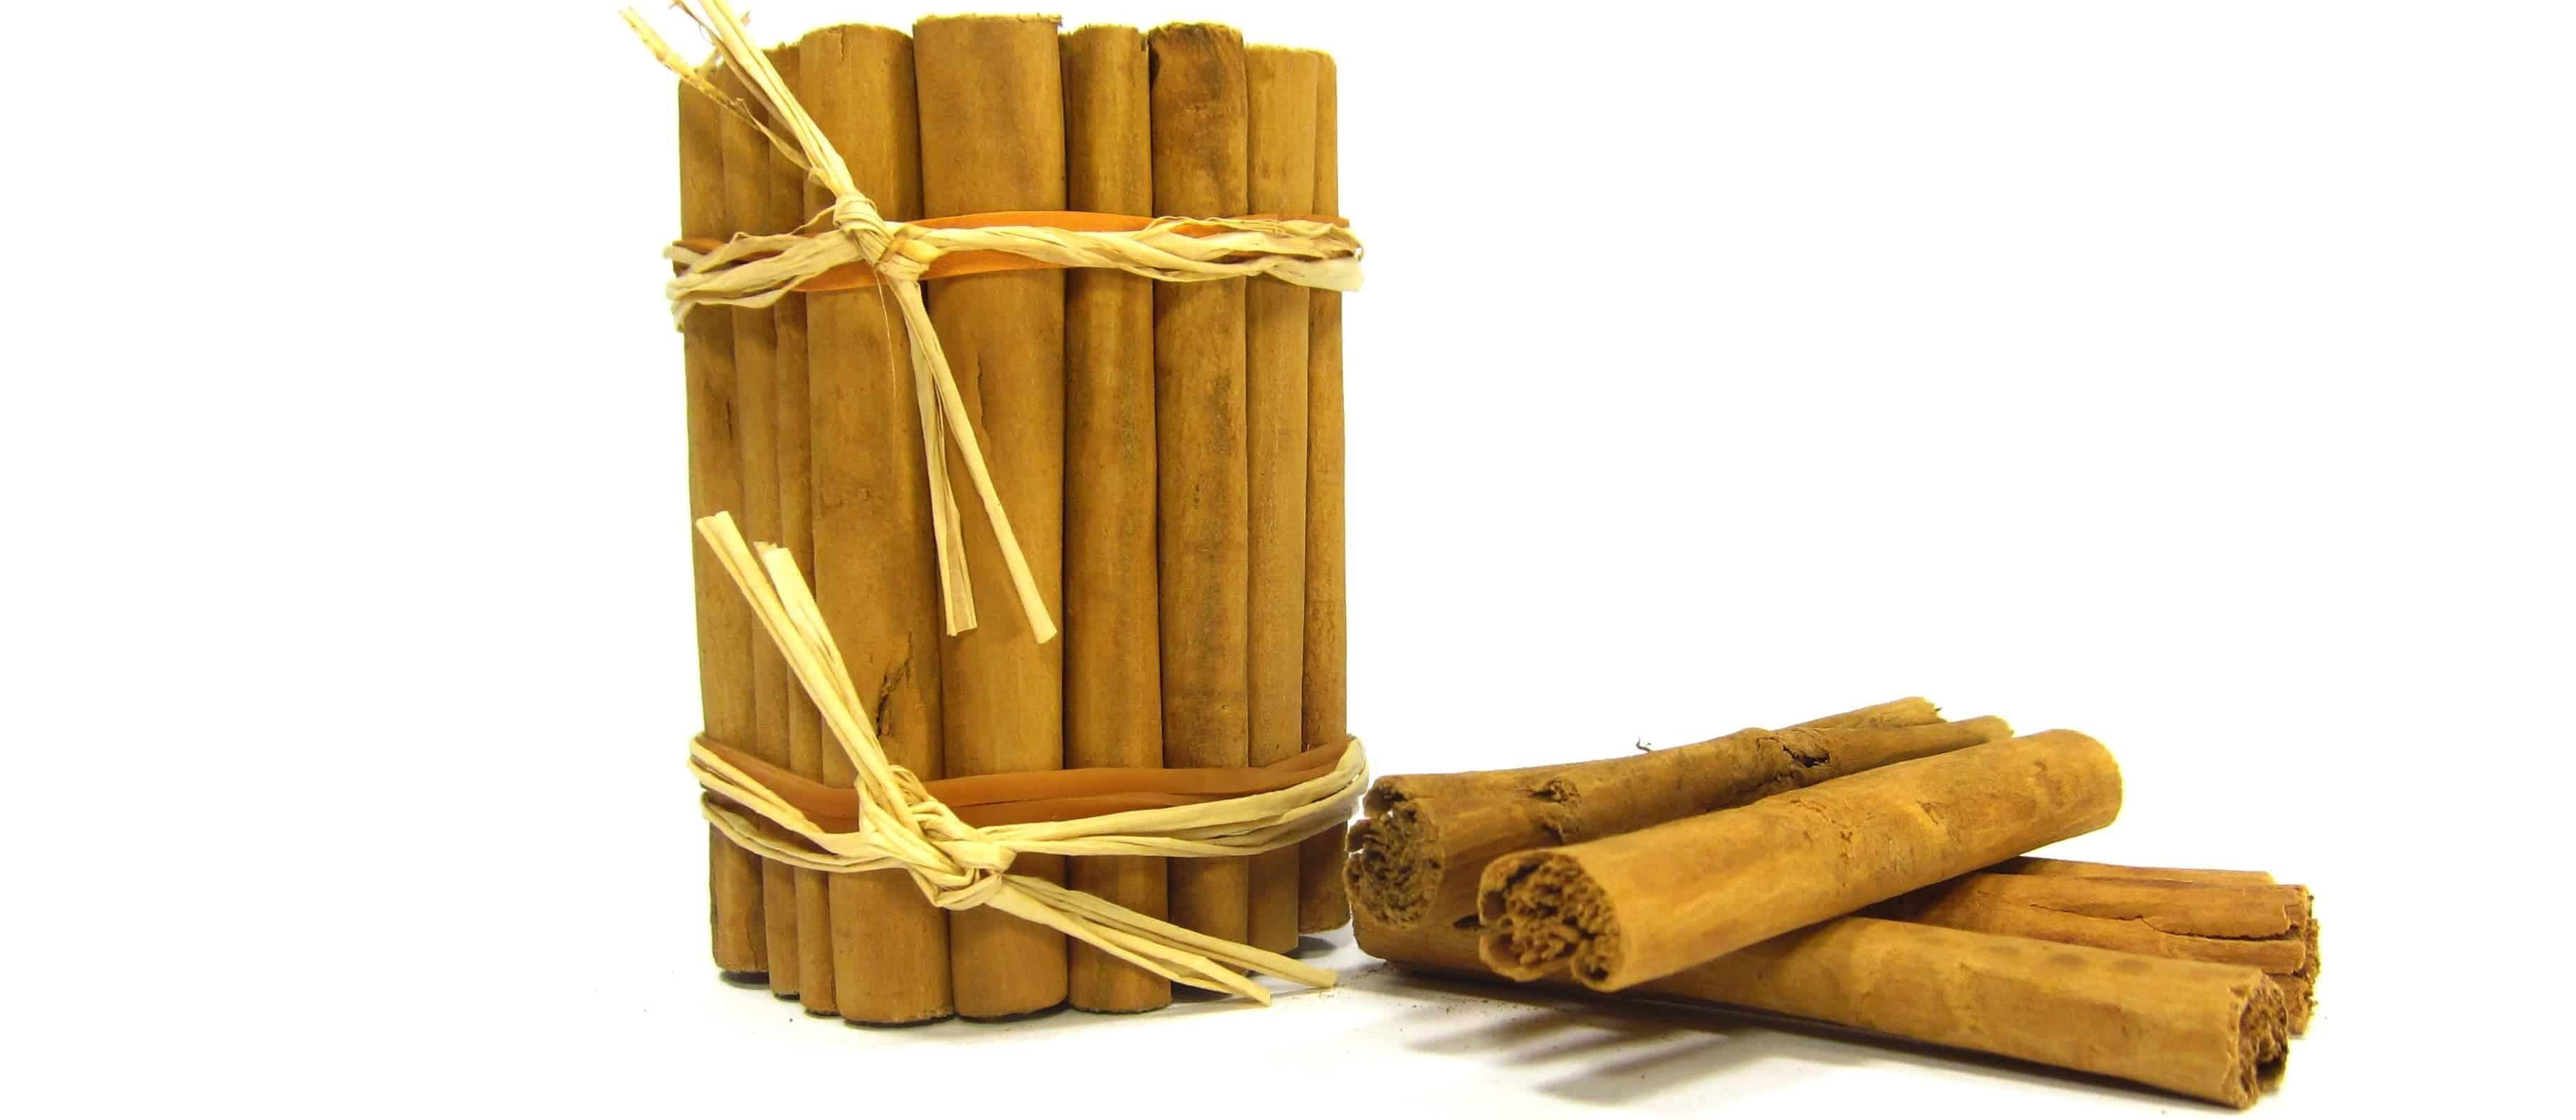 How Do You Take Cinnamon For Diabetes?